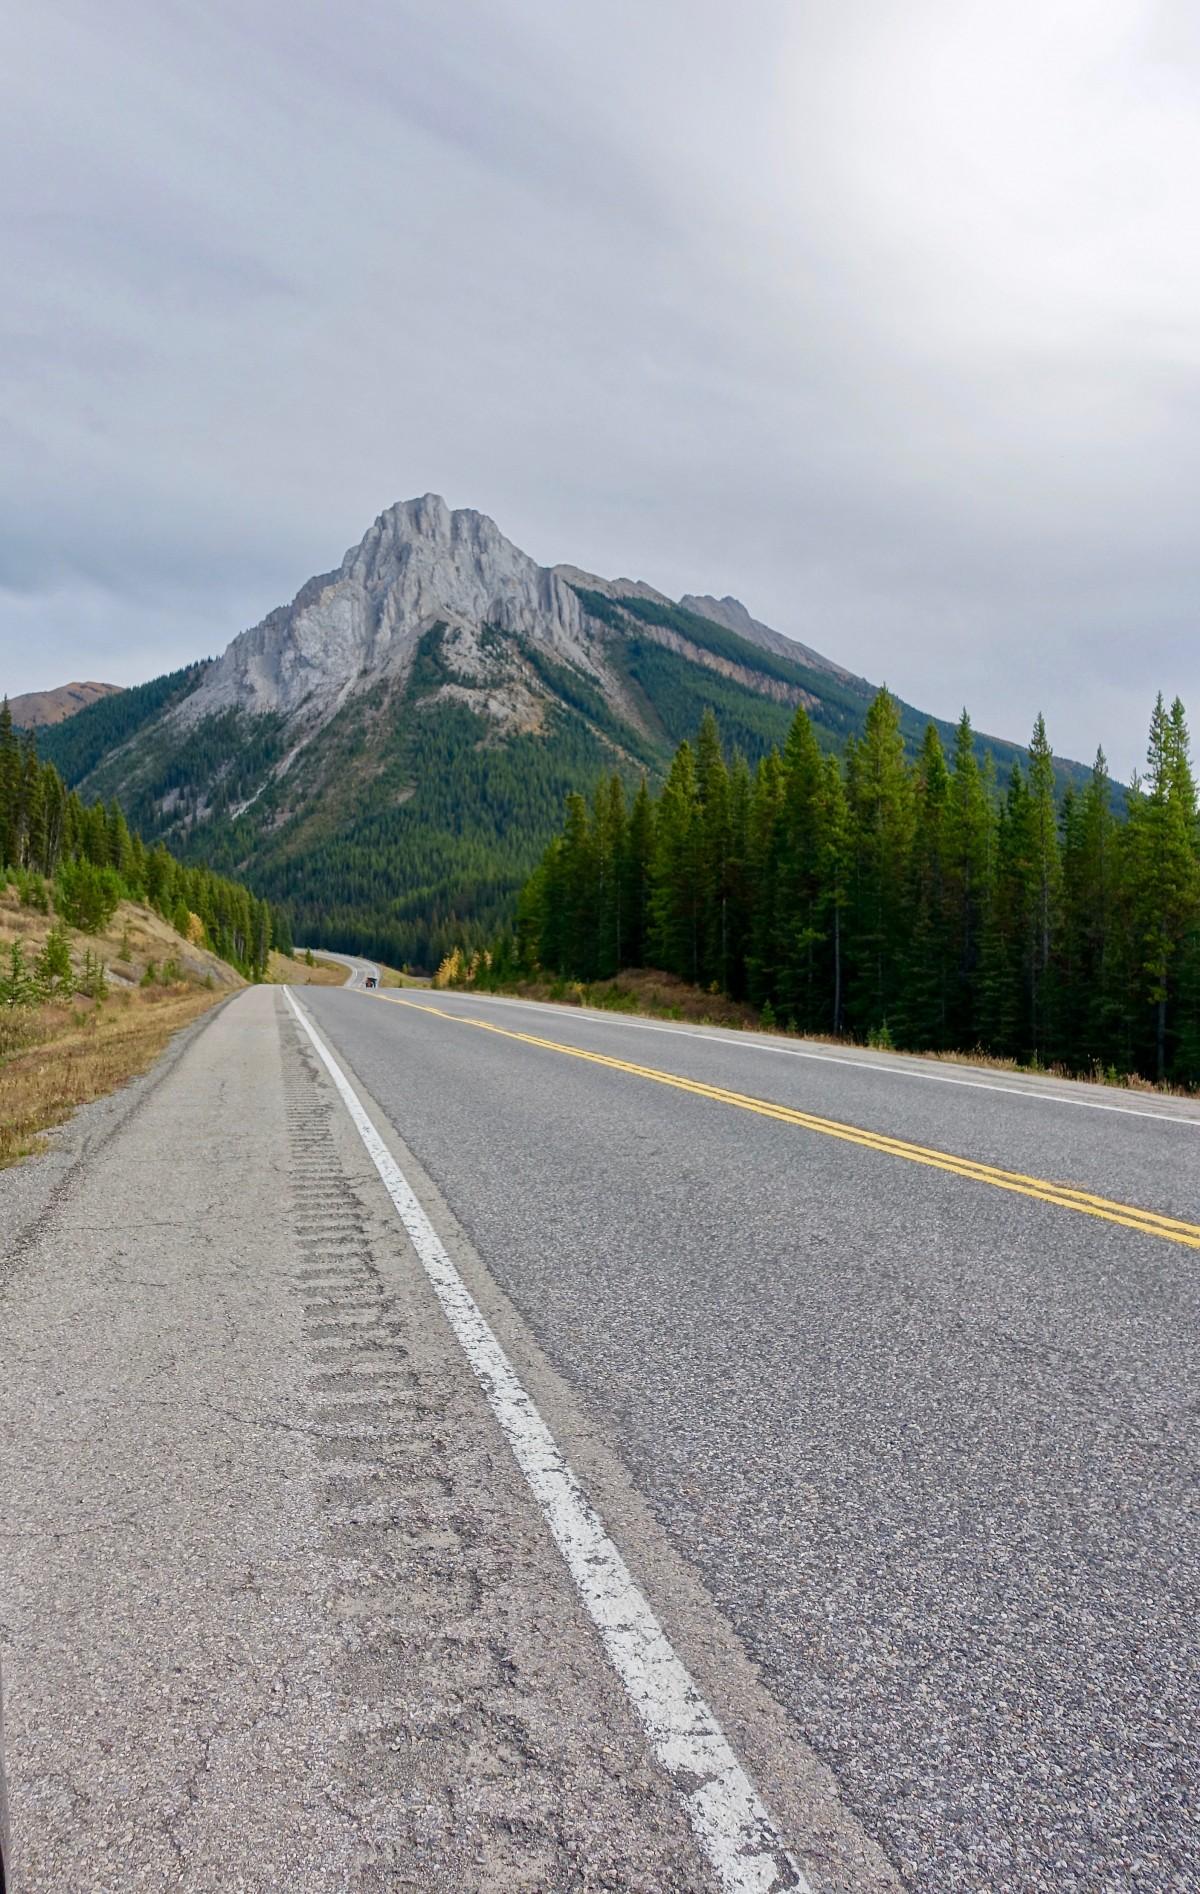 Gambar : pemandangan, jalan raya, batu, aspal, jalur ...